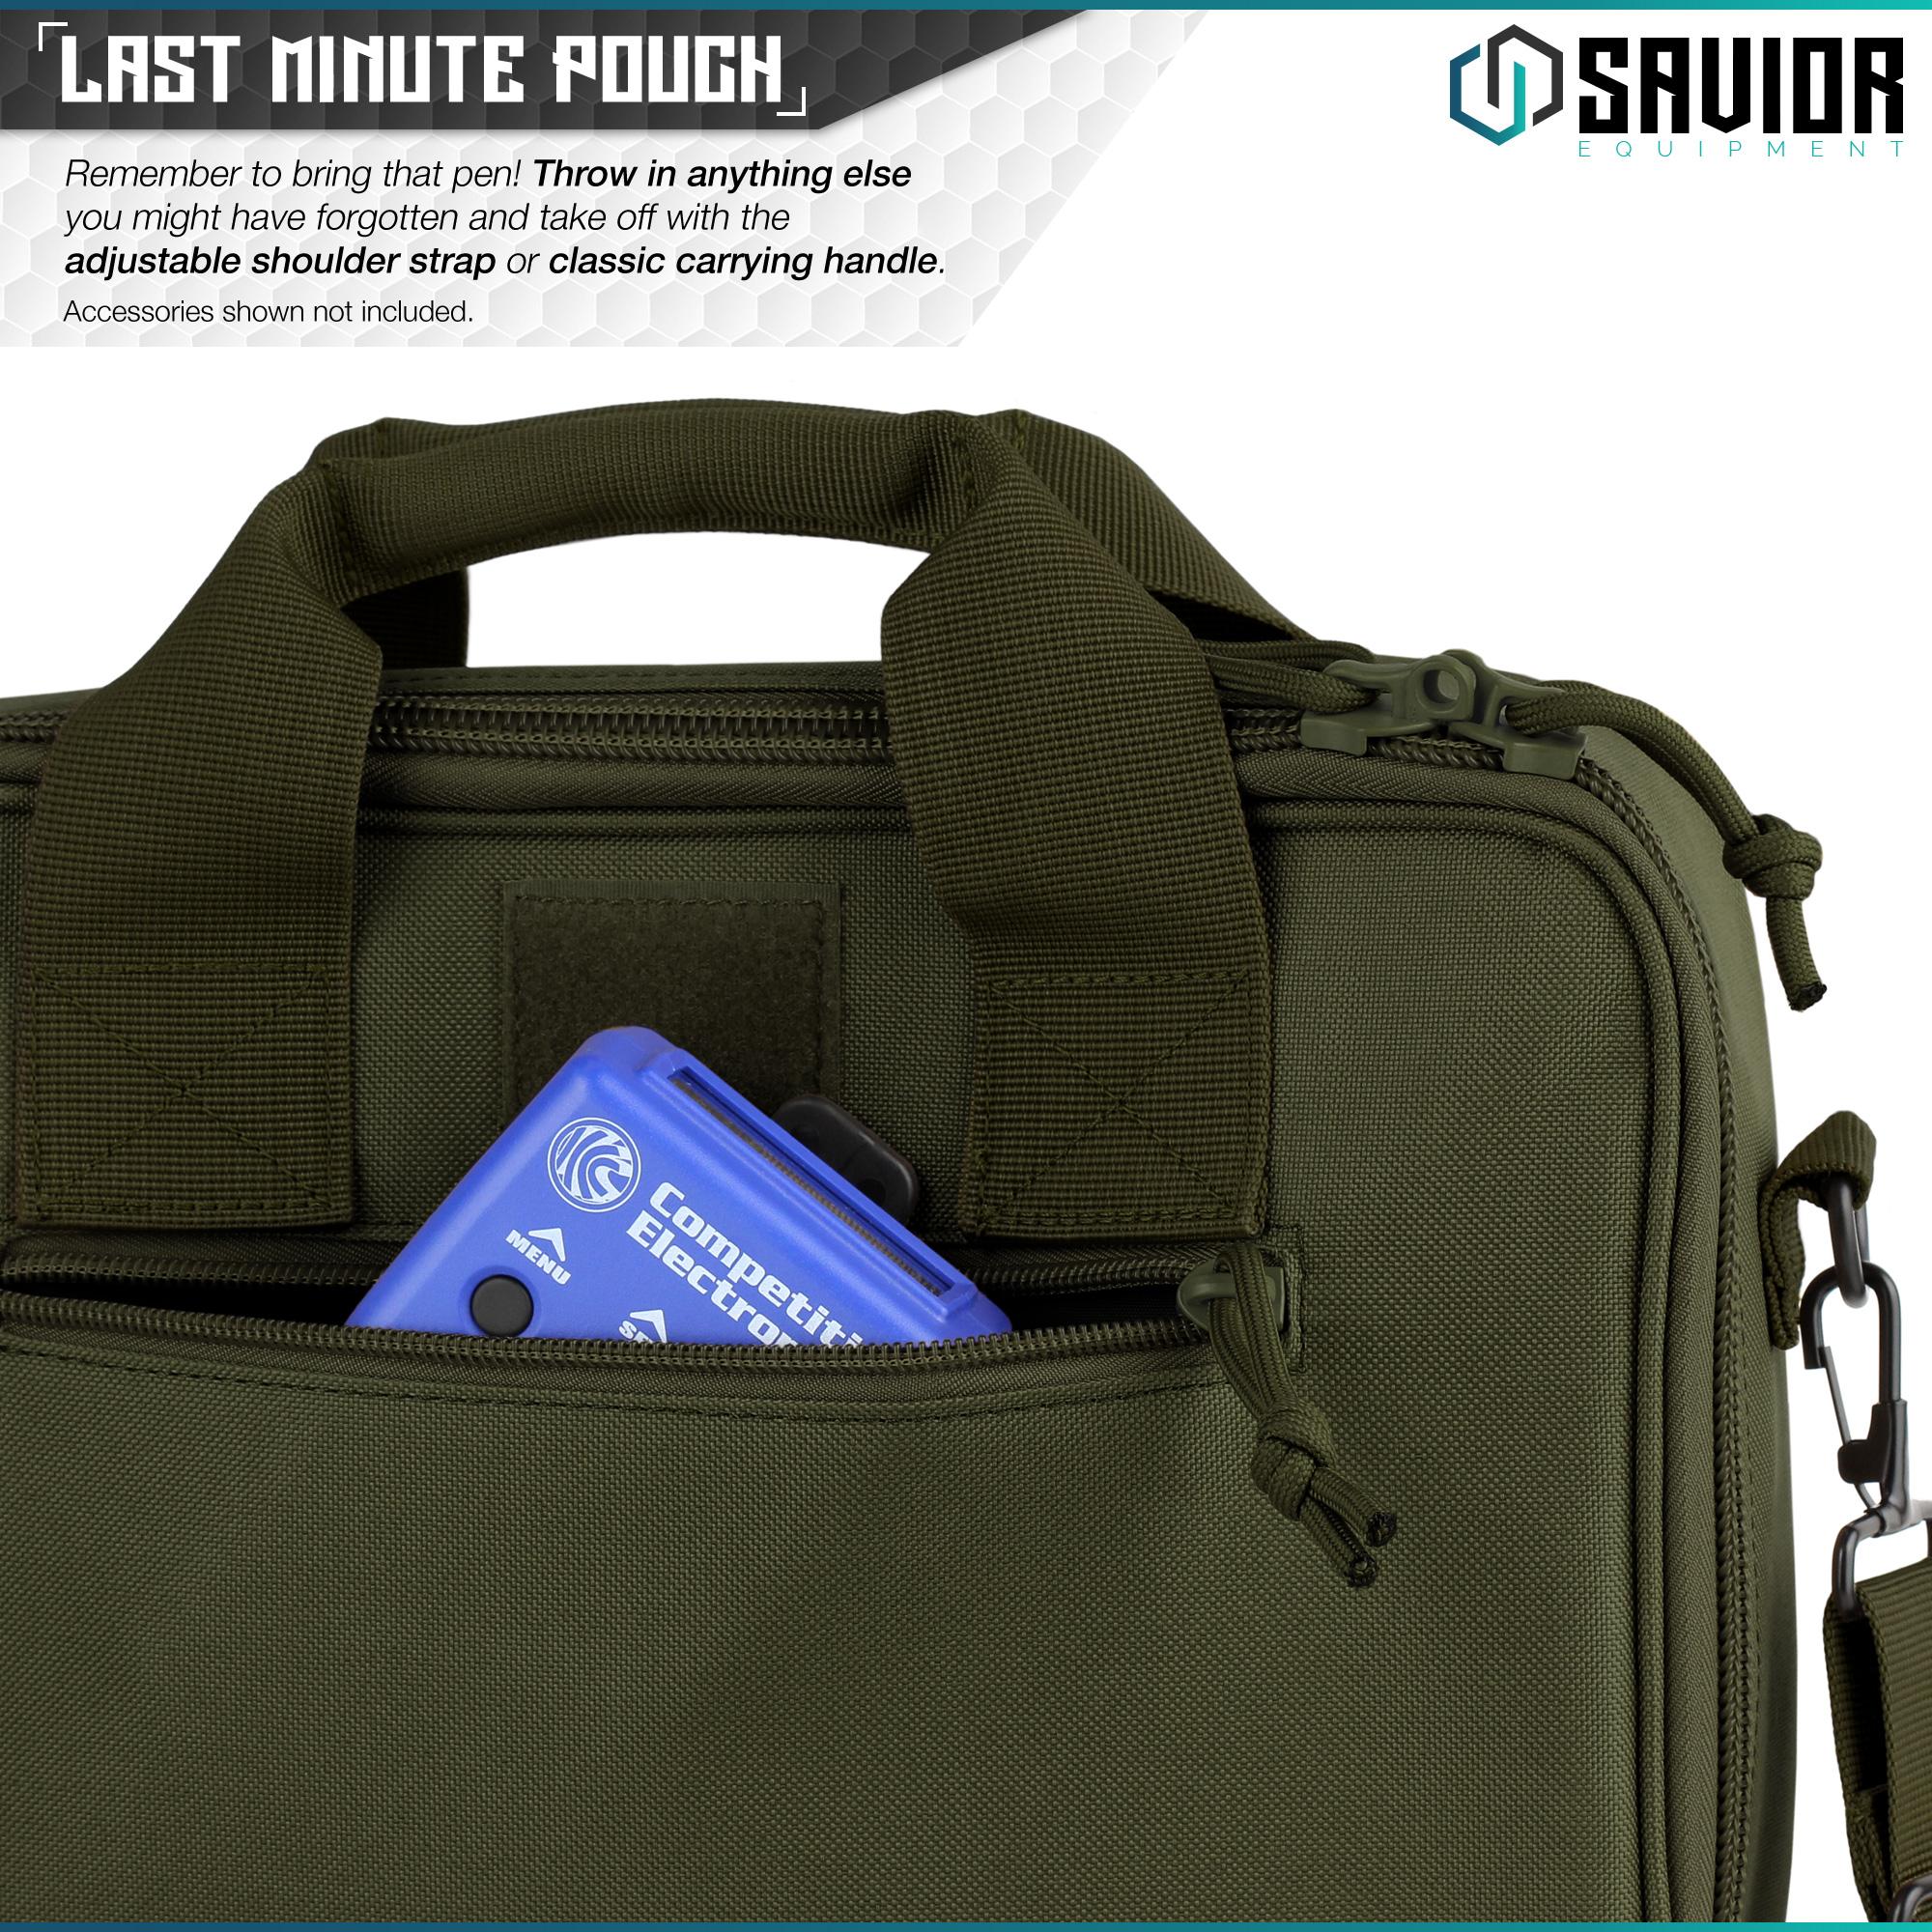 thumbnail 24 - 034-SAVIOR-034-Padded-Discreet-Double-Handgun-Bag-Pistol-Storage-Case-w-Mag-Pouch-Slot